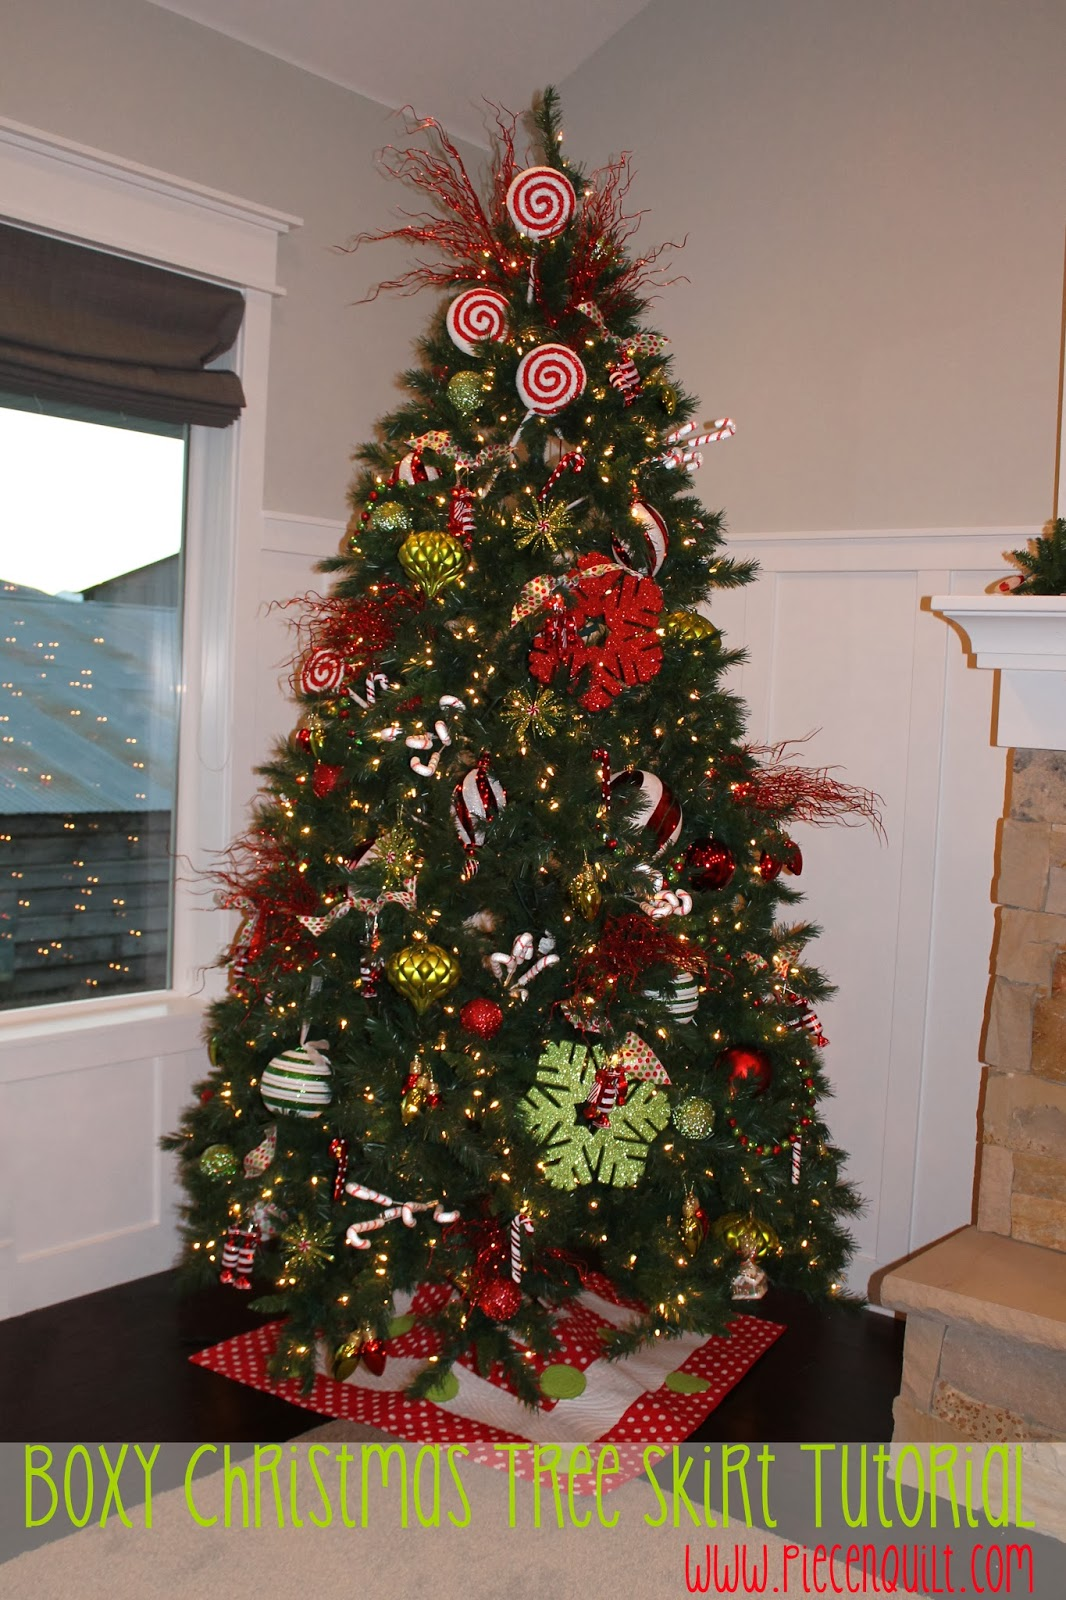 Piece n quilt boxy christmas tree skirt tutorial